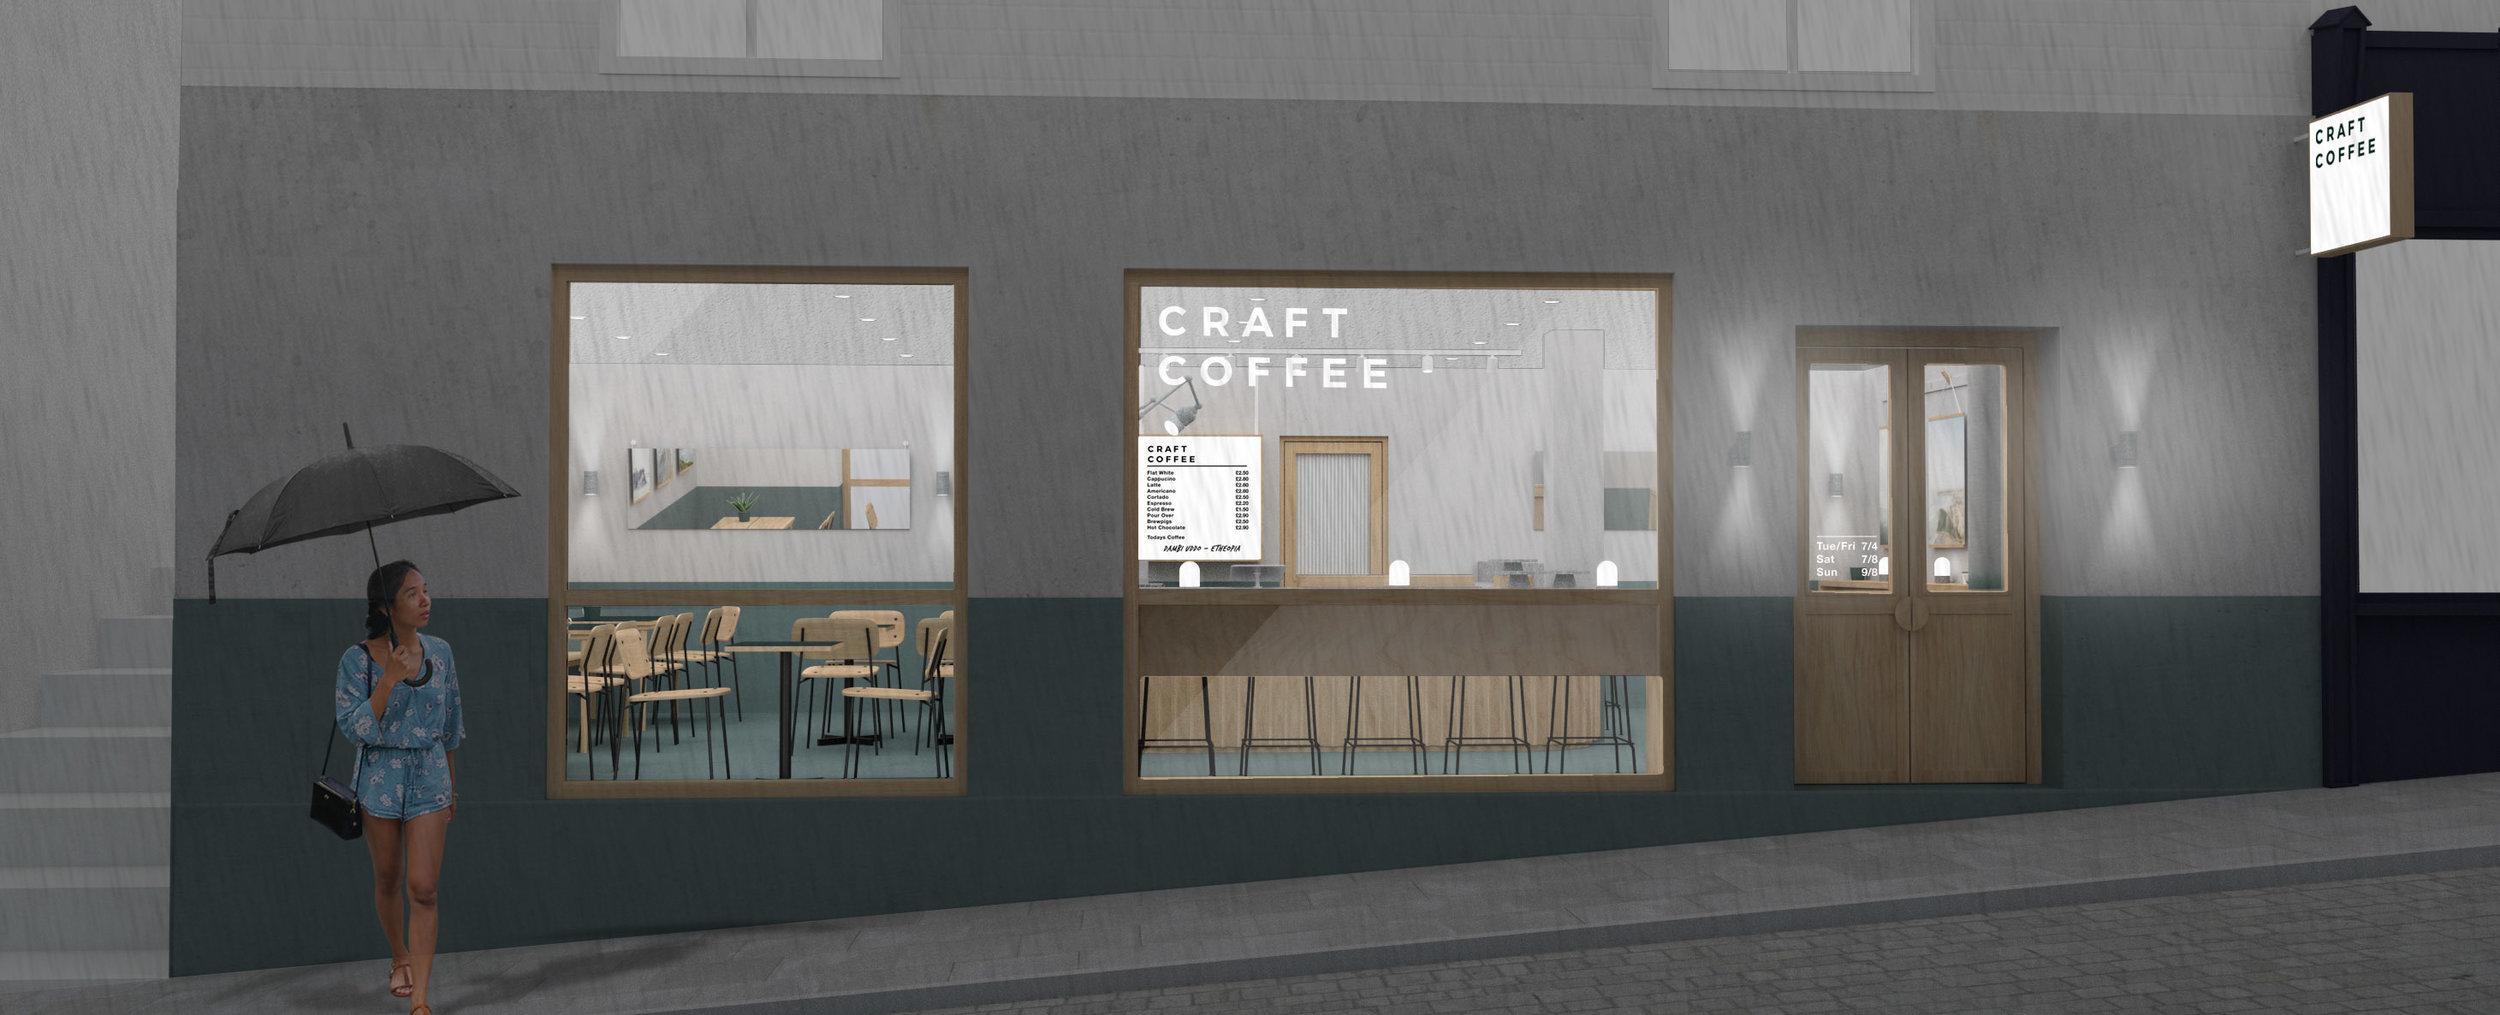 lunarlunar_interior_design_cafe_craft_coffee_banquette_hastings_front rain.jpg